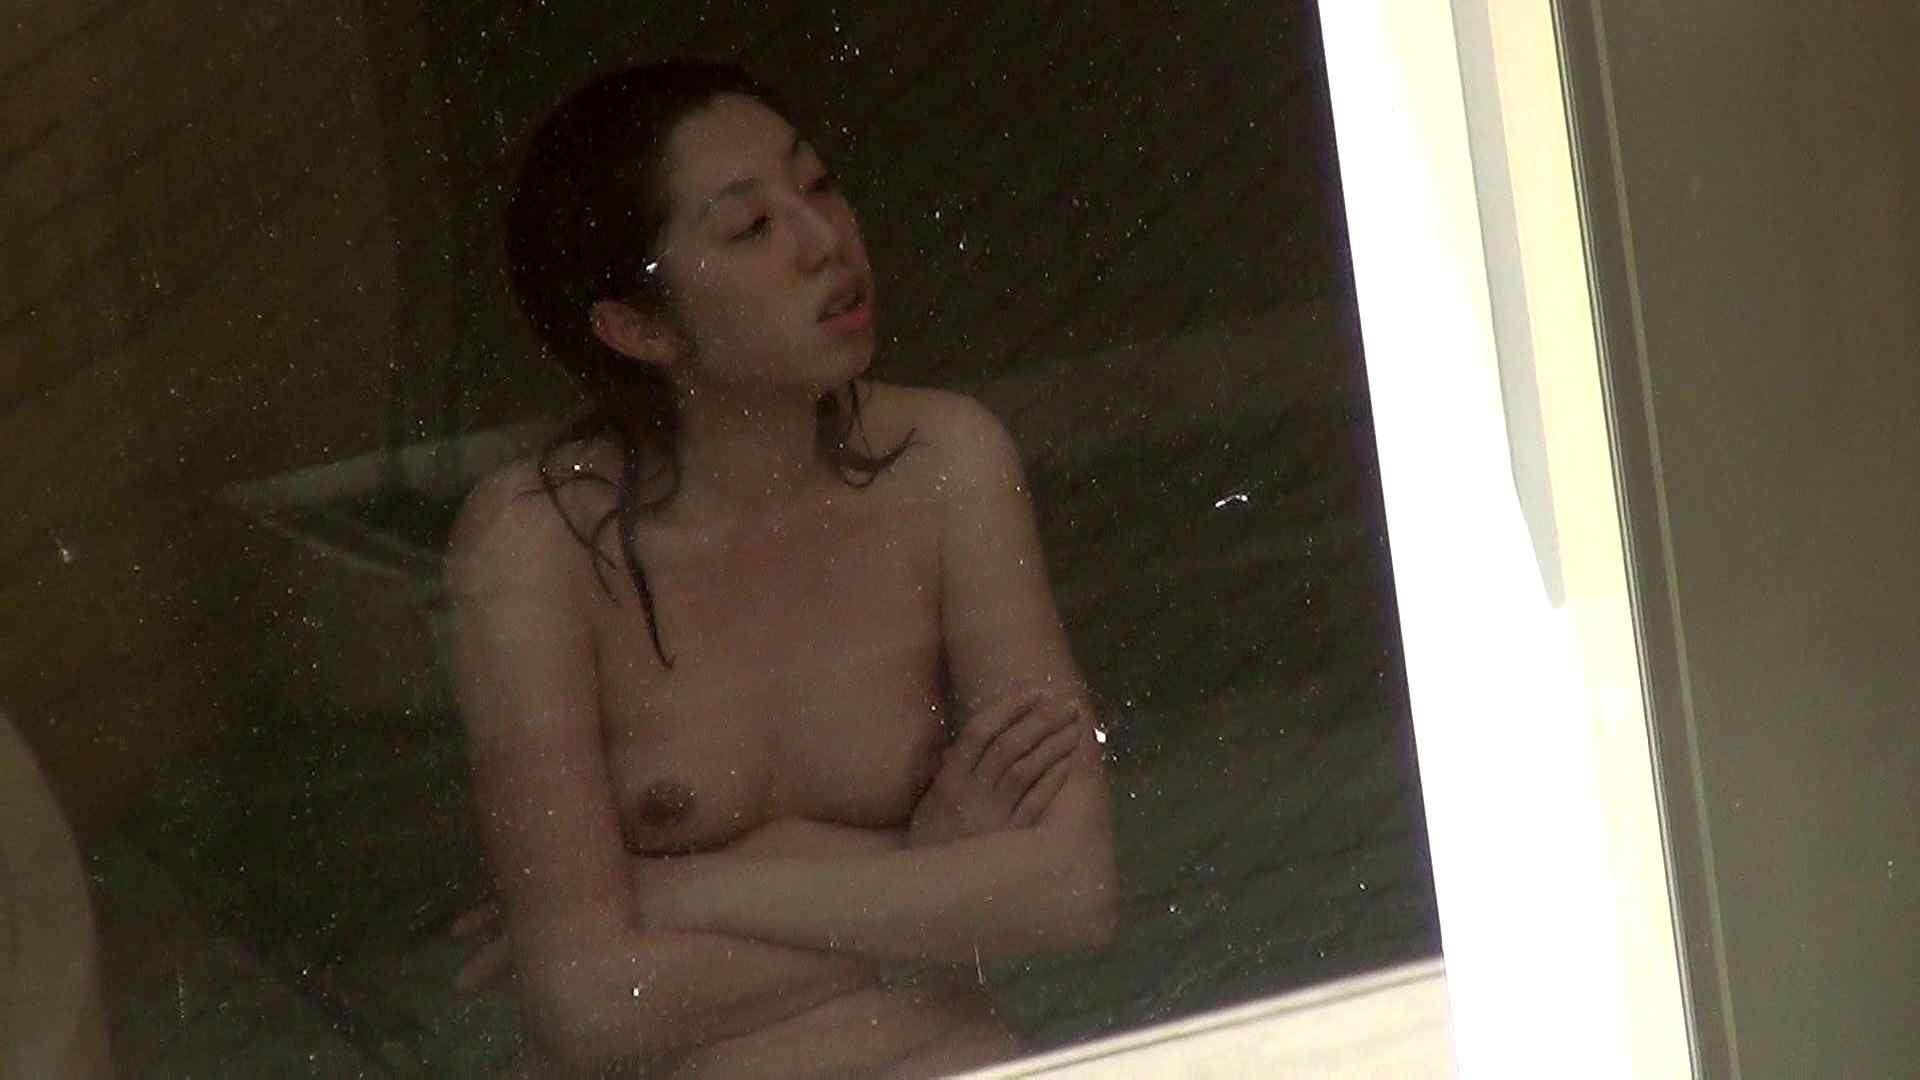 Aquaな露天風呂Vol.265 露天風呂編  108PIX 104